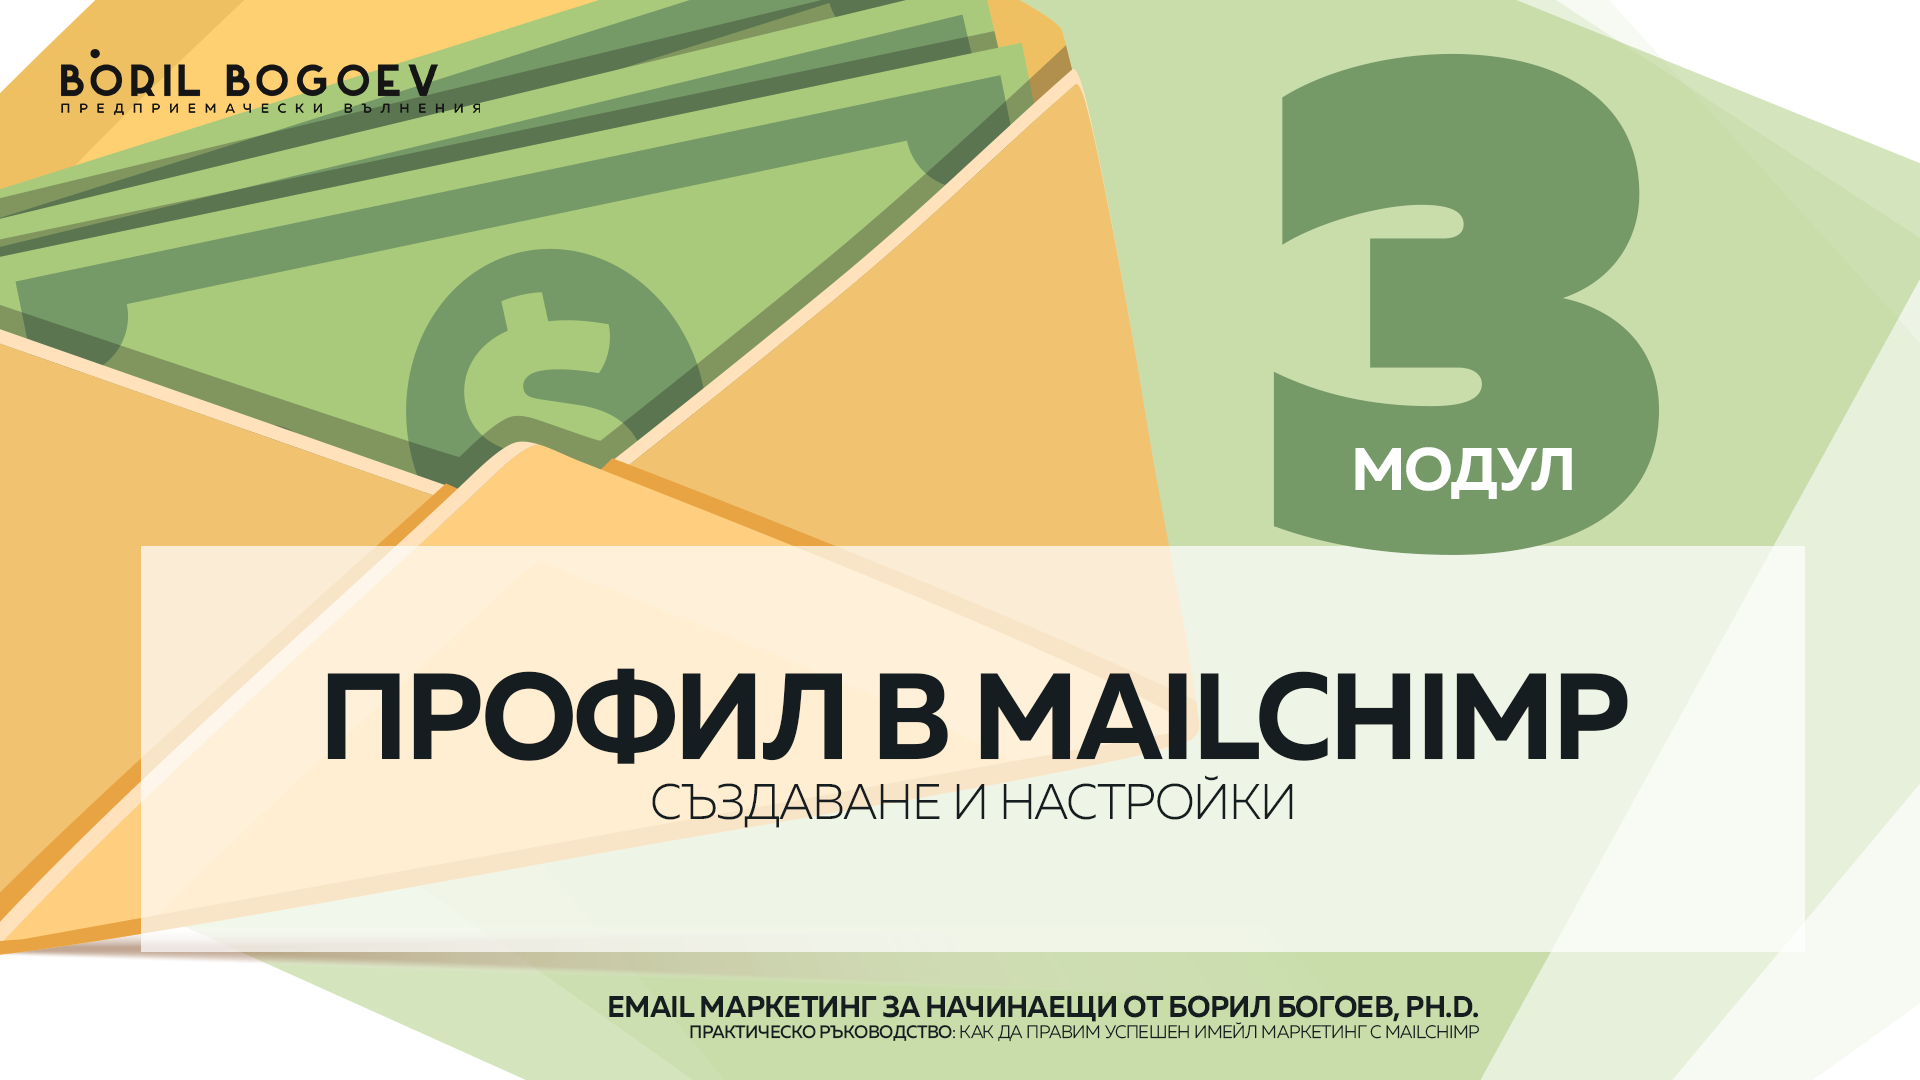 emb-presentation-m3